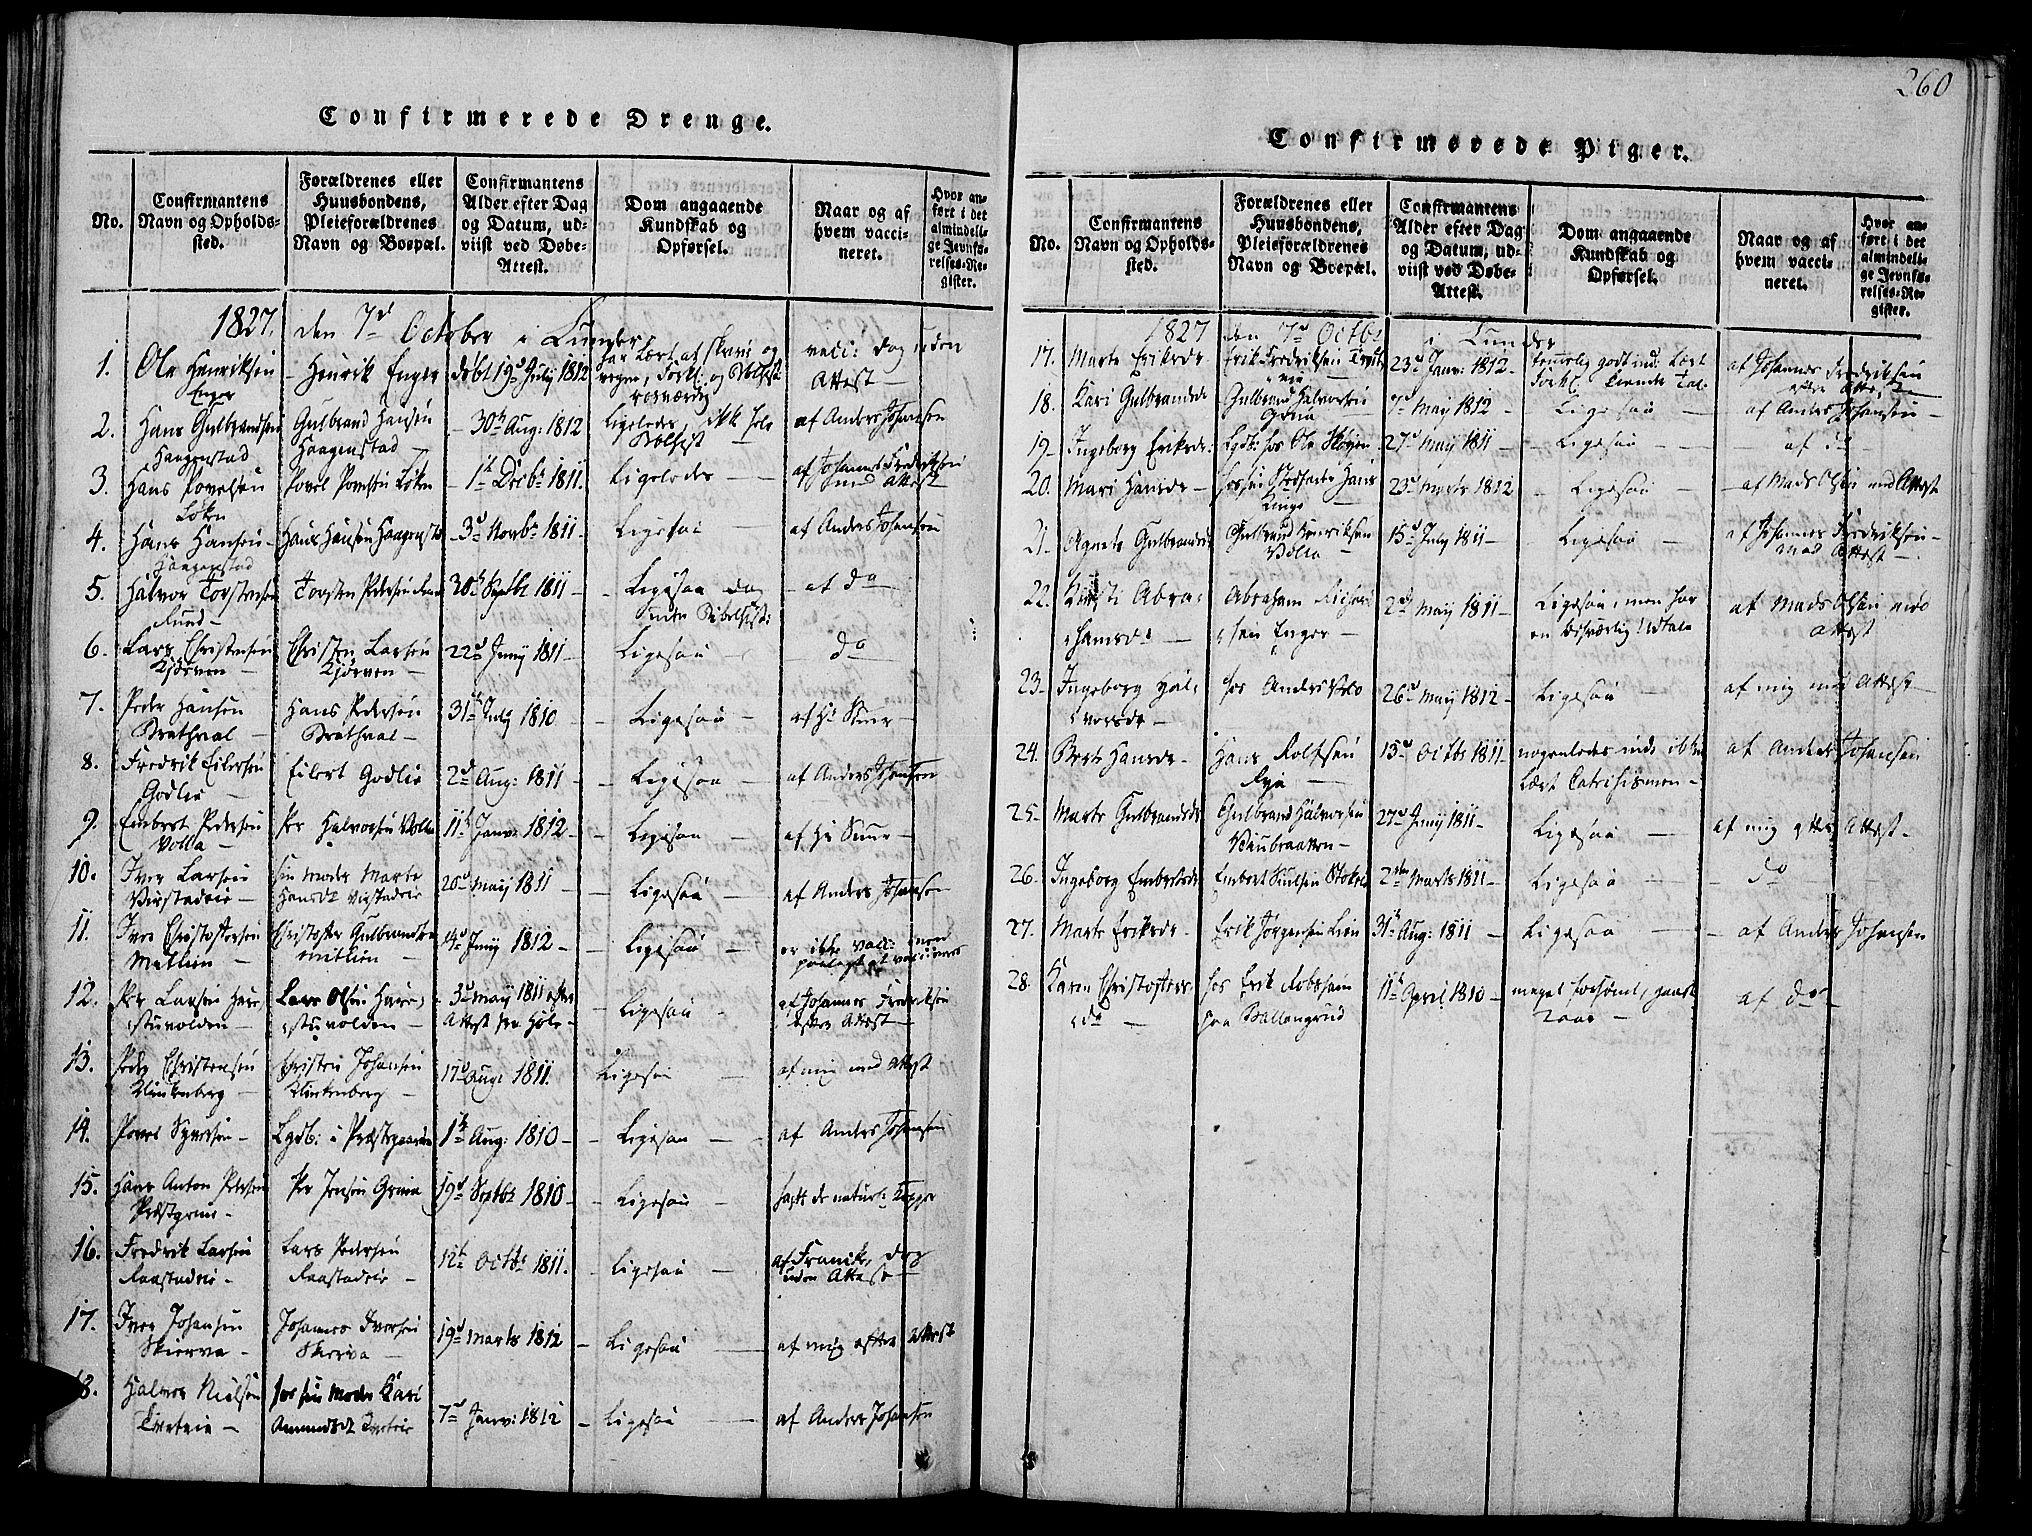 SAH, Jevnaker prestekontor, Ministerialbok nr. 5, 1815-1837, s. 260